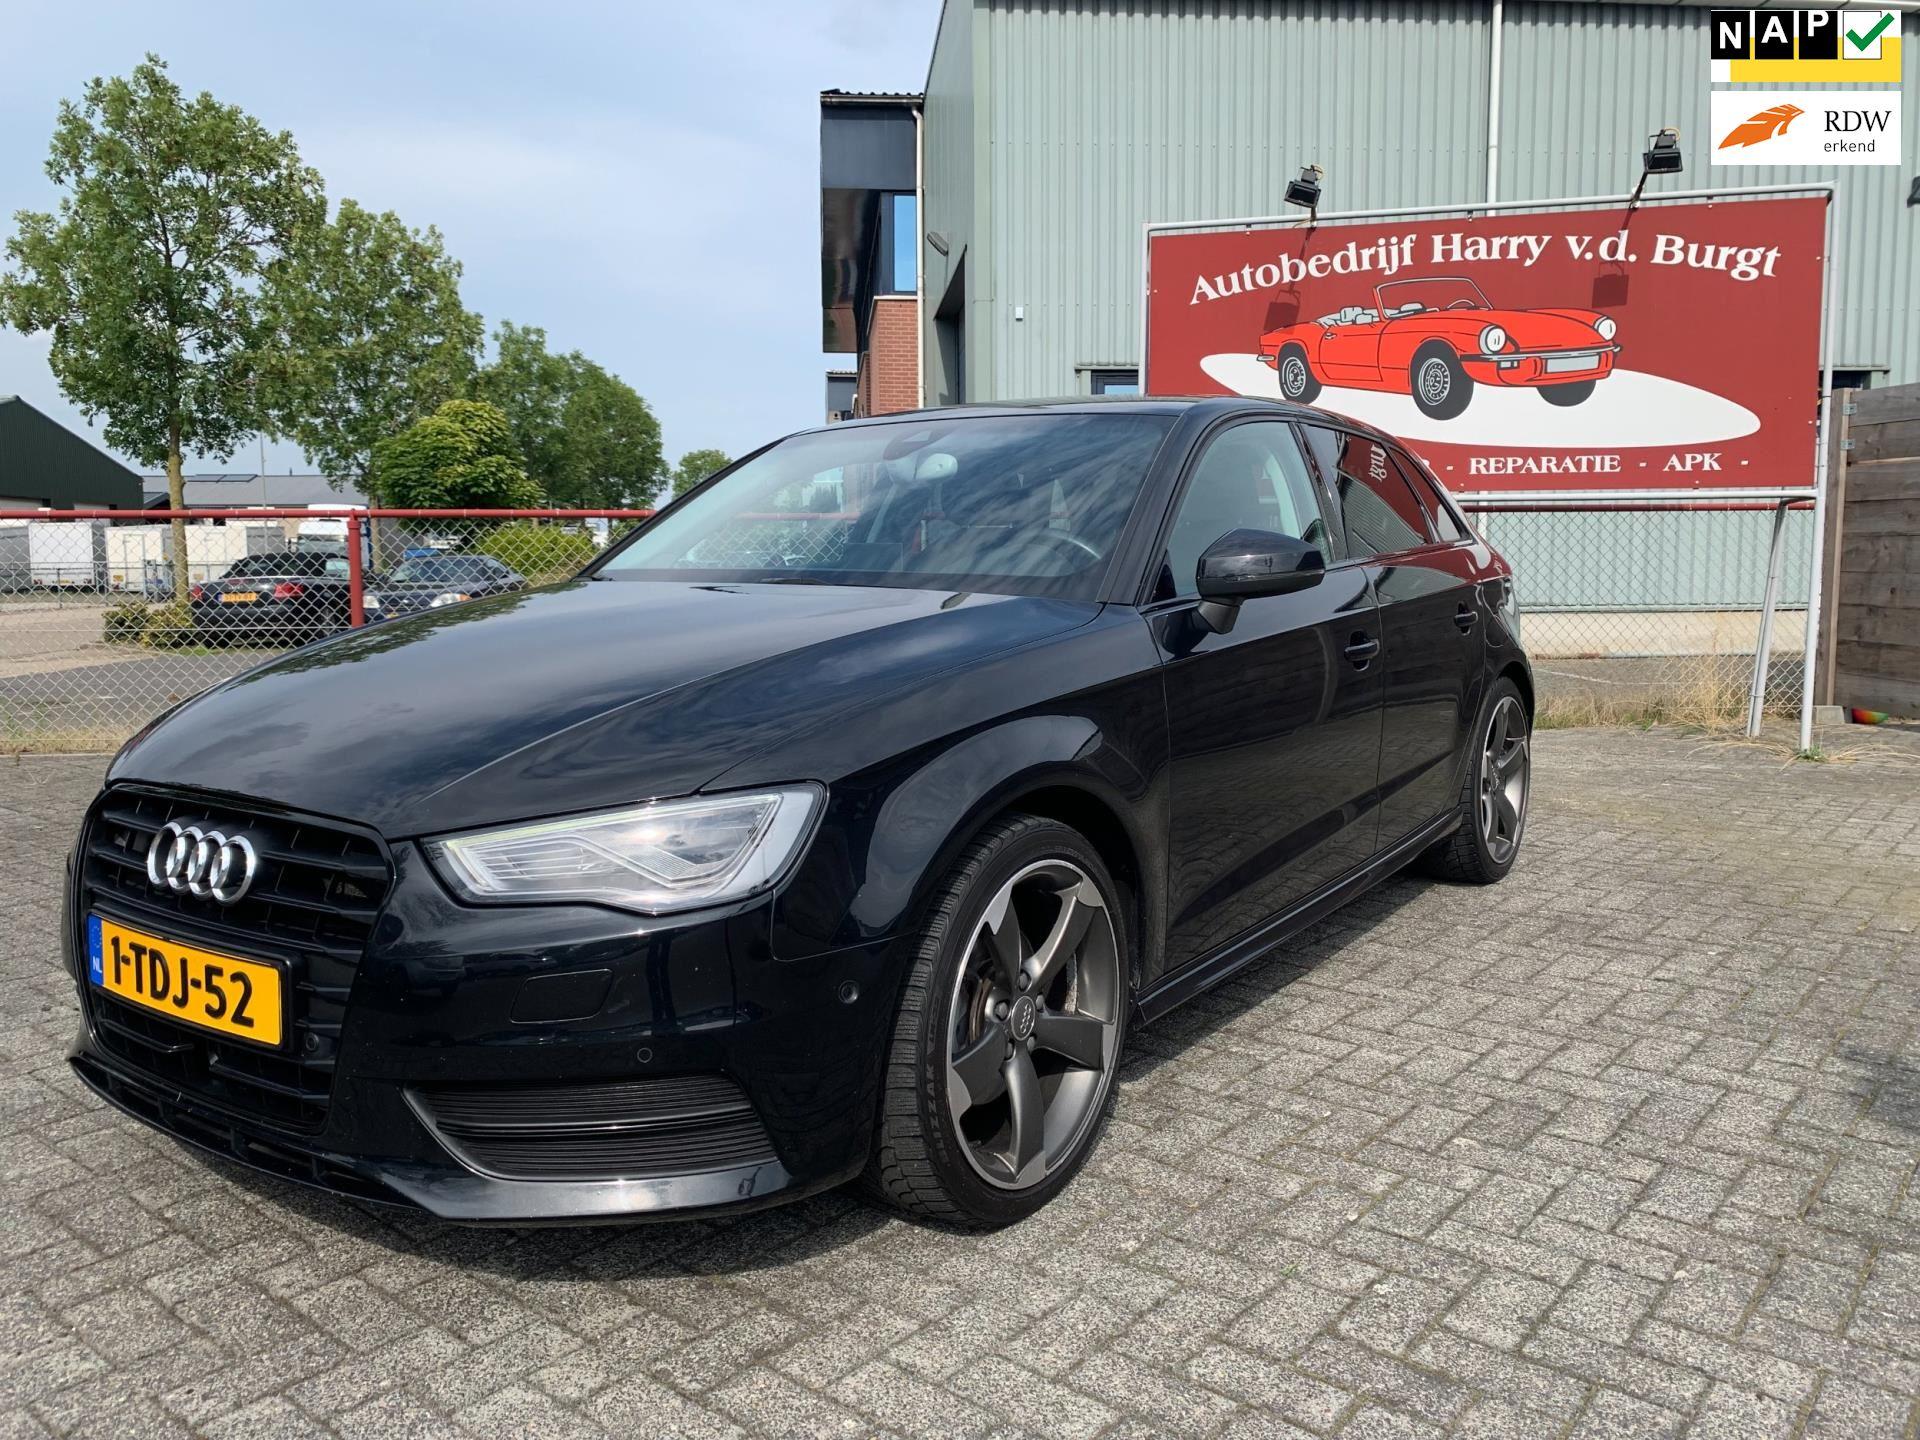 Audi A3 Sportback occasion - Autobedrijf Harry van der Burgt